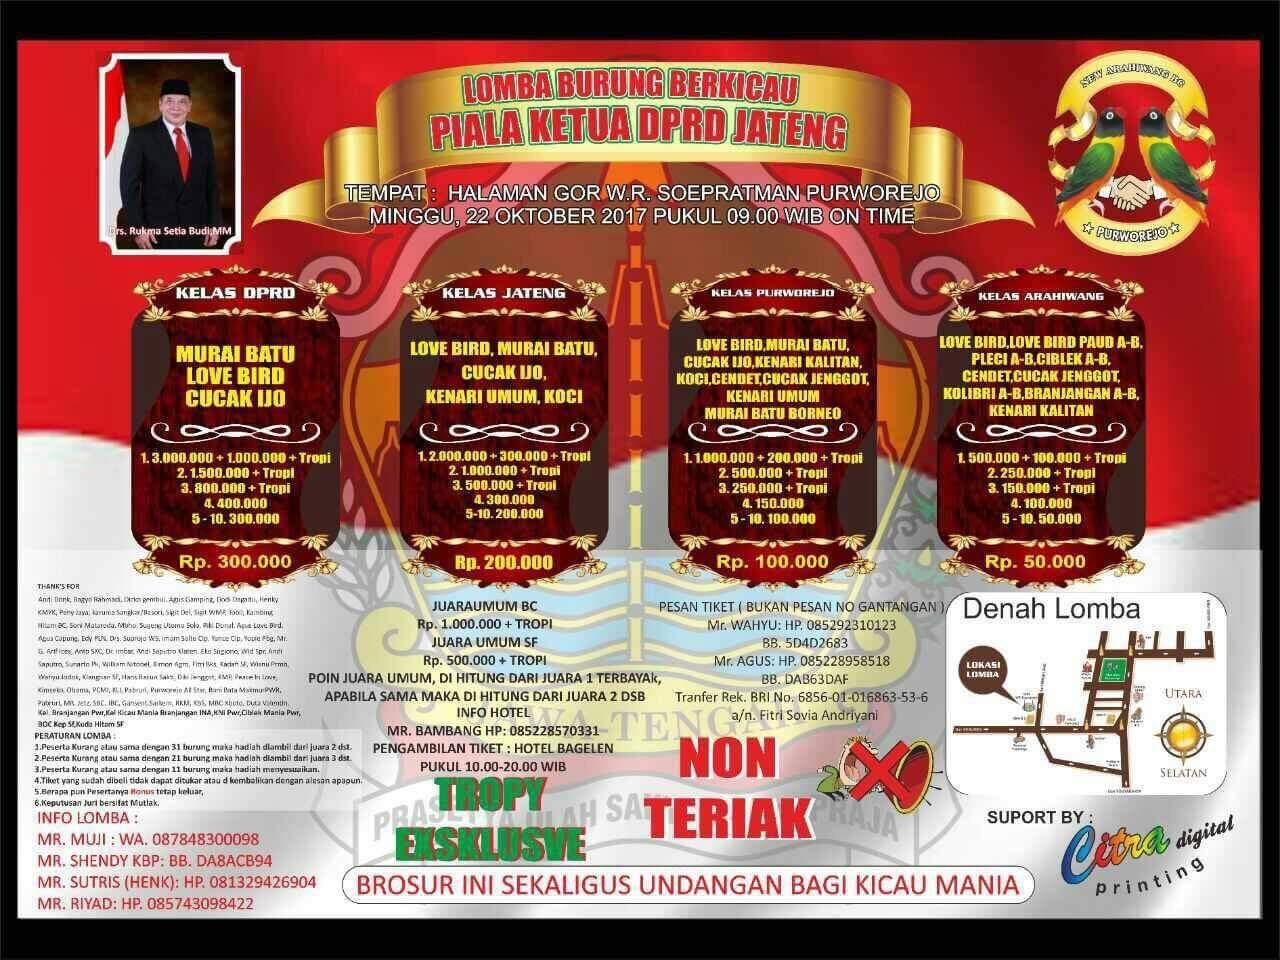 Brosur Piala Ketua DPRD Jateng